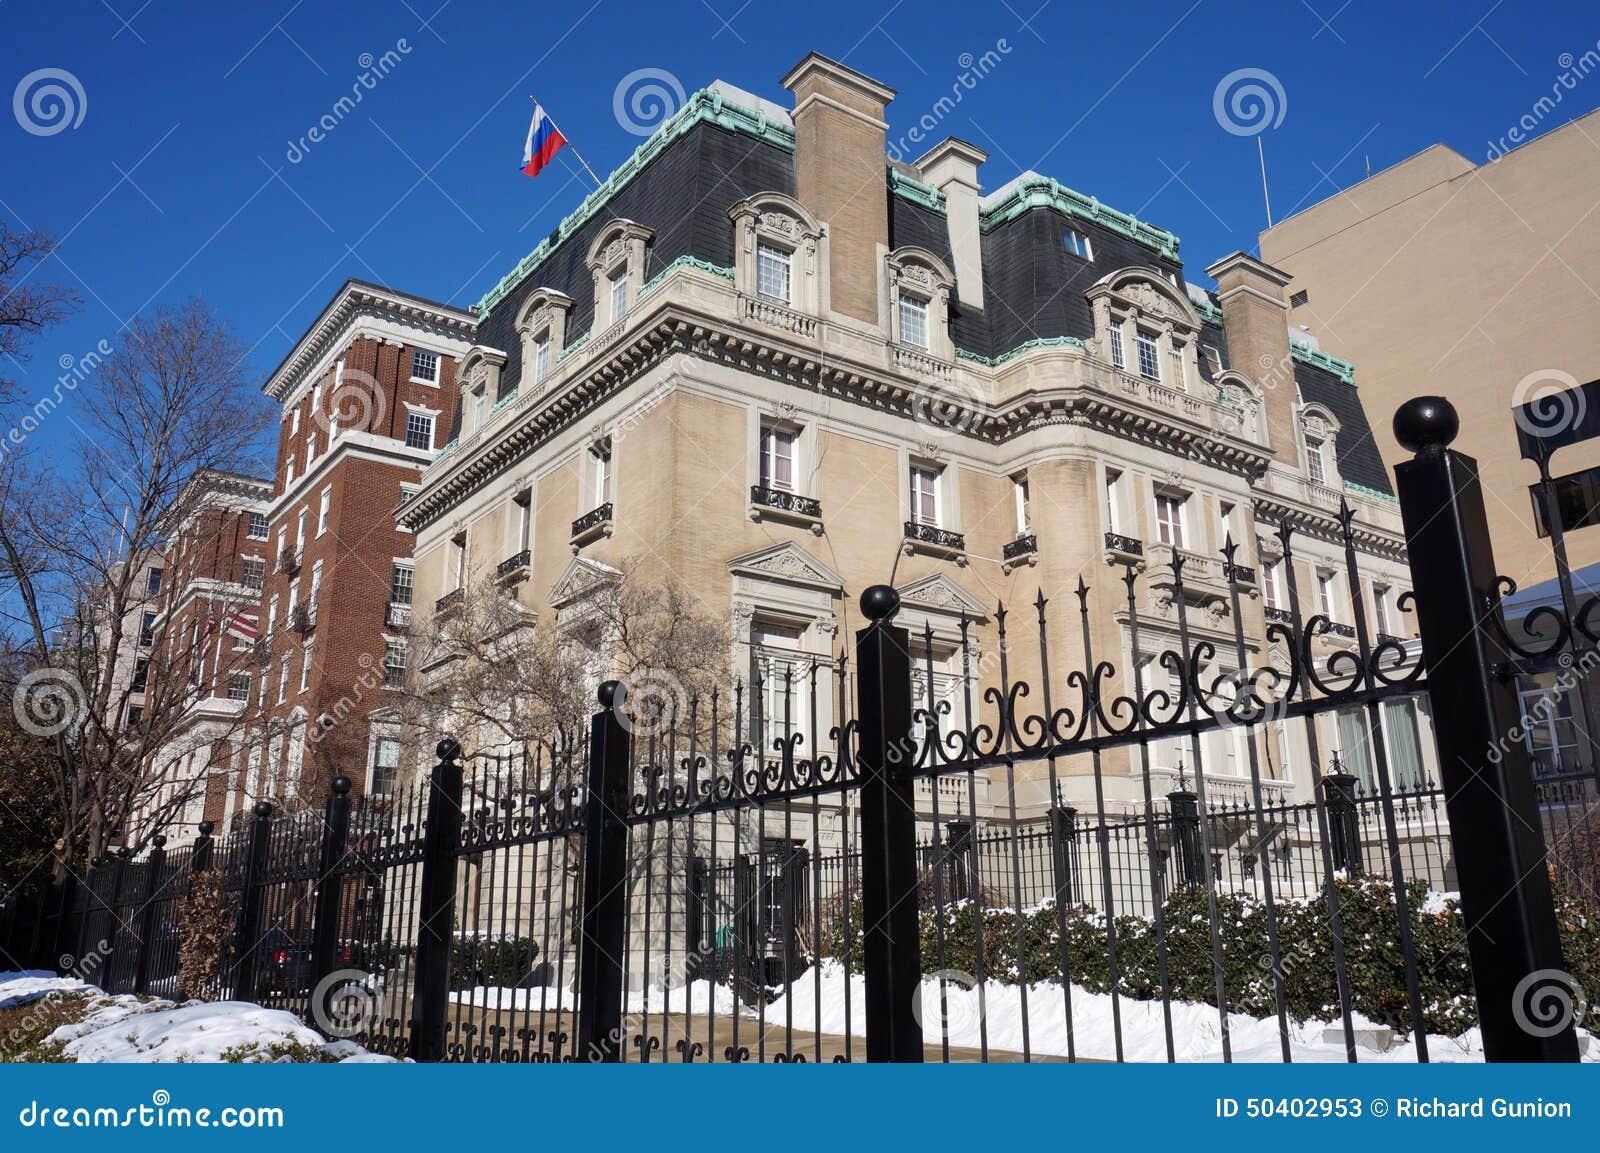 Russian Ambassador to the U.S. Residence